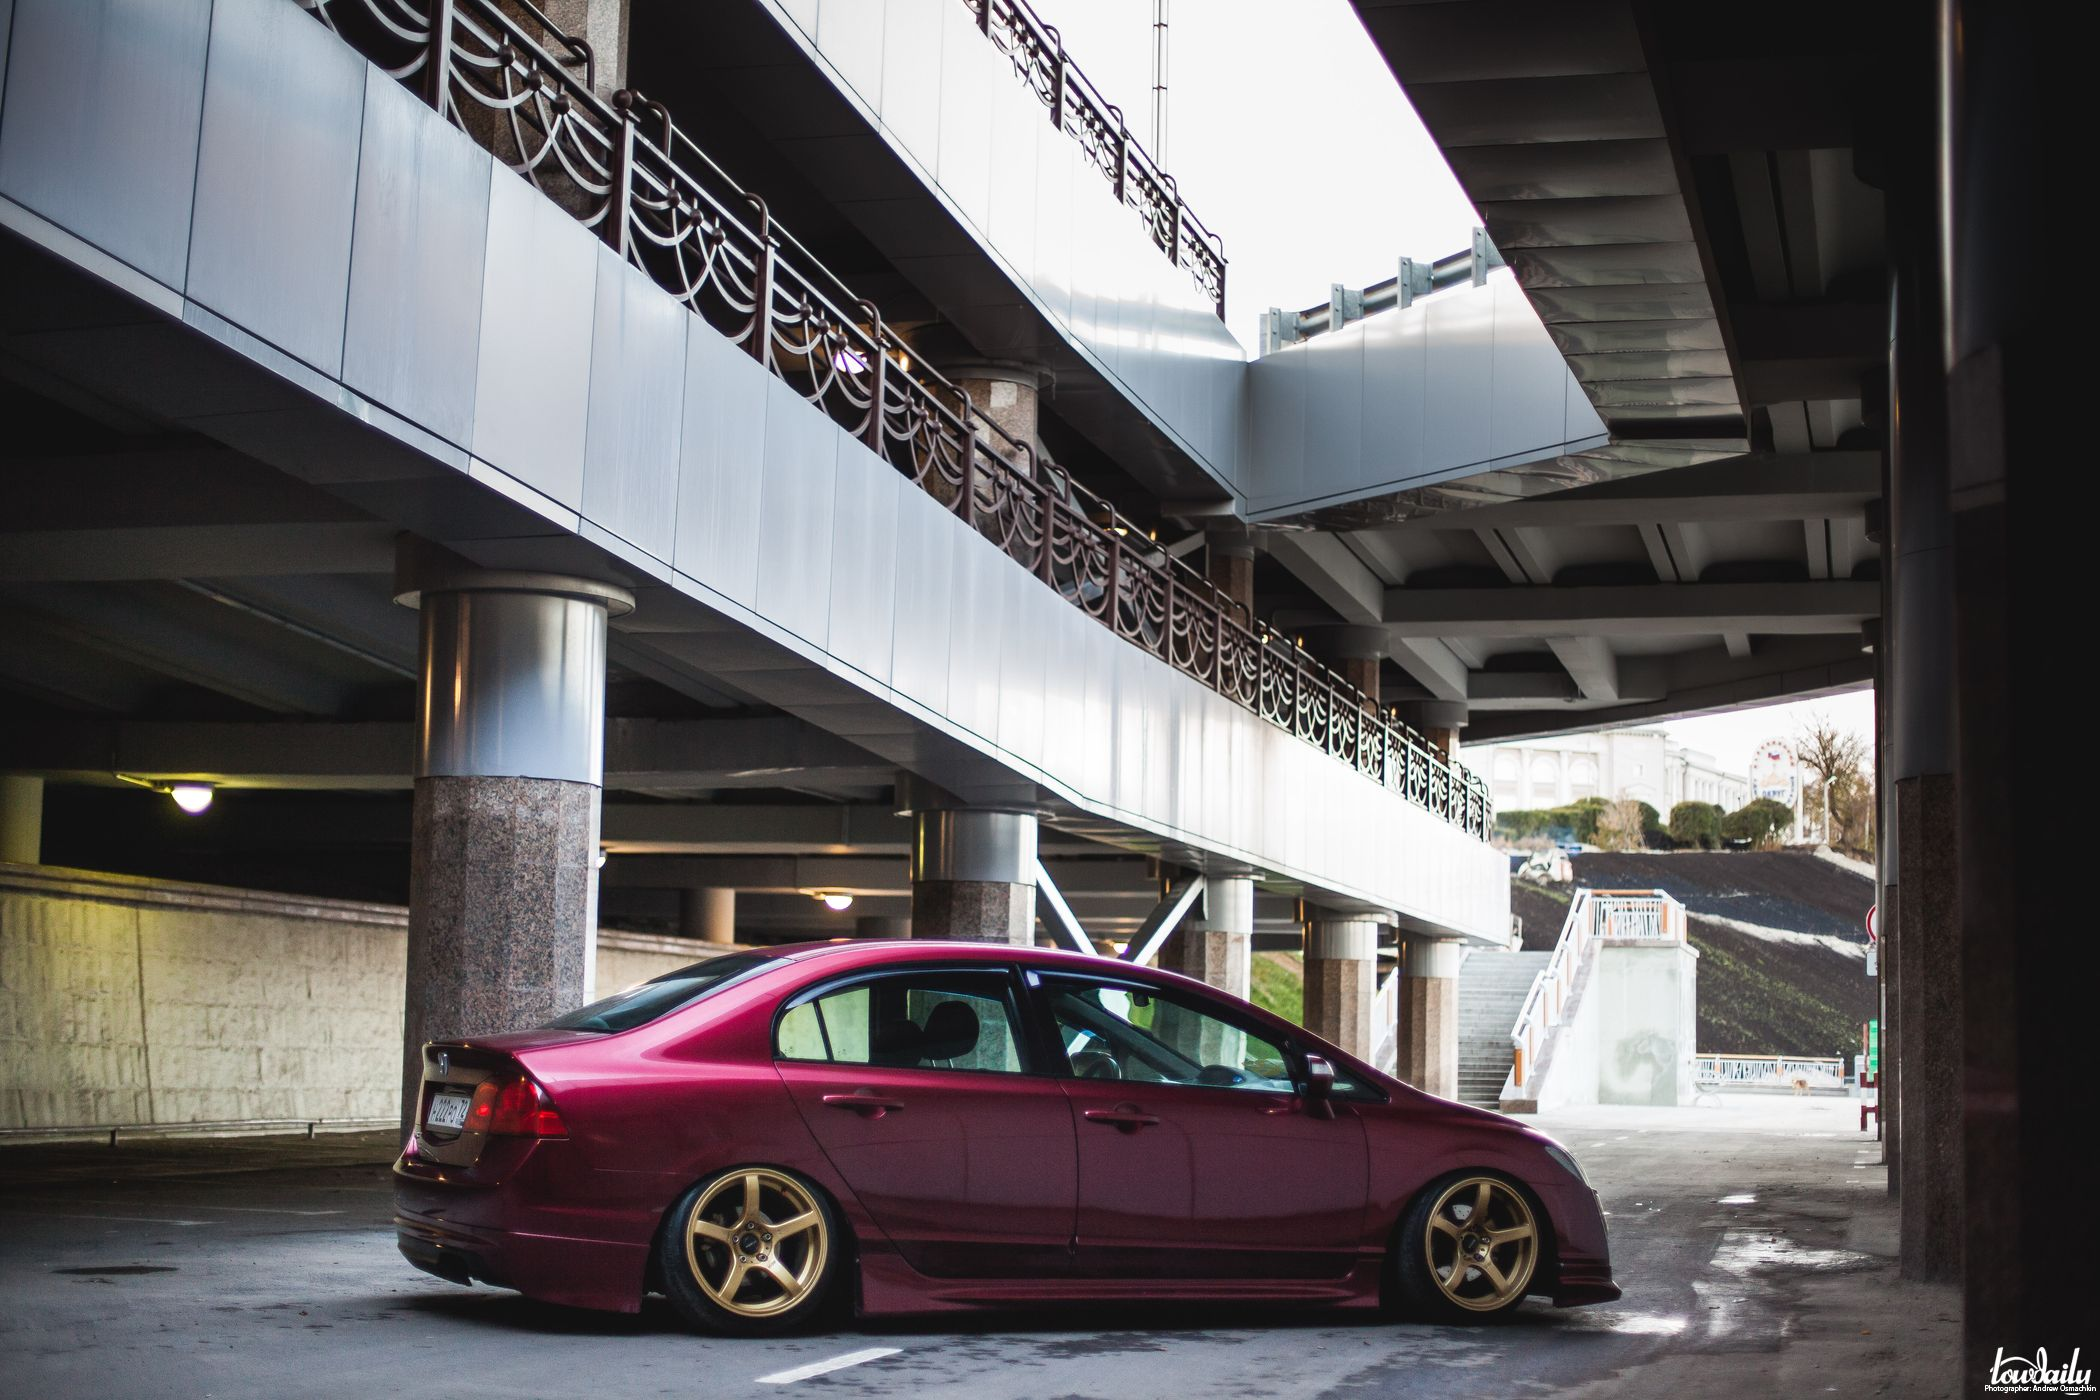 Mg_5437_Honda_Civic